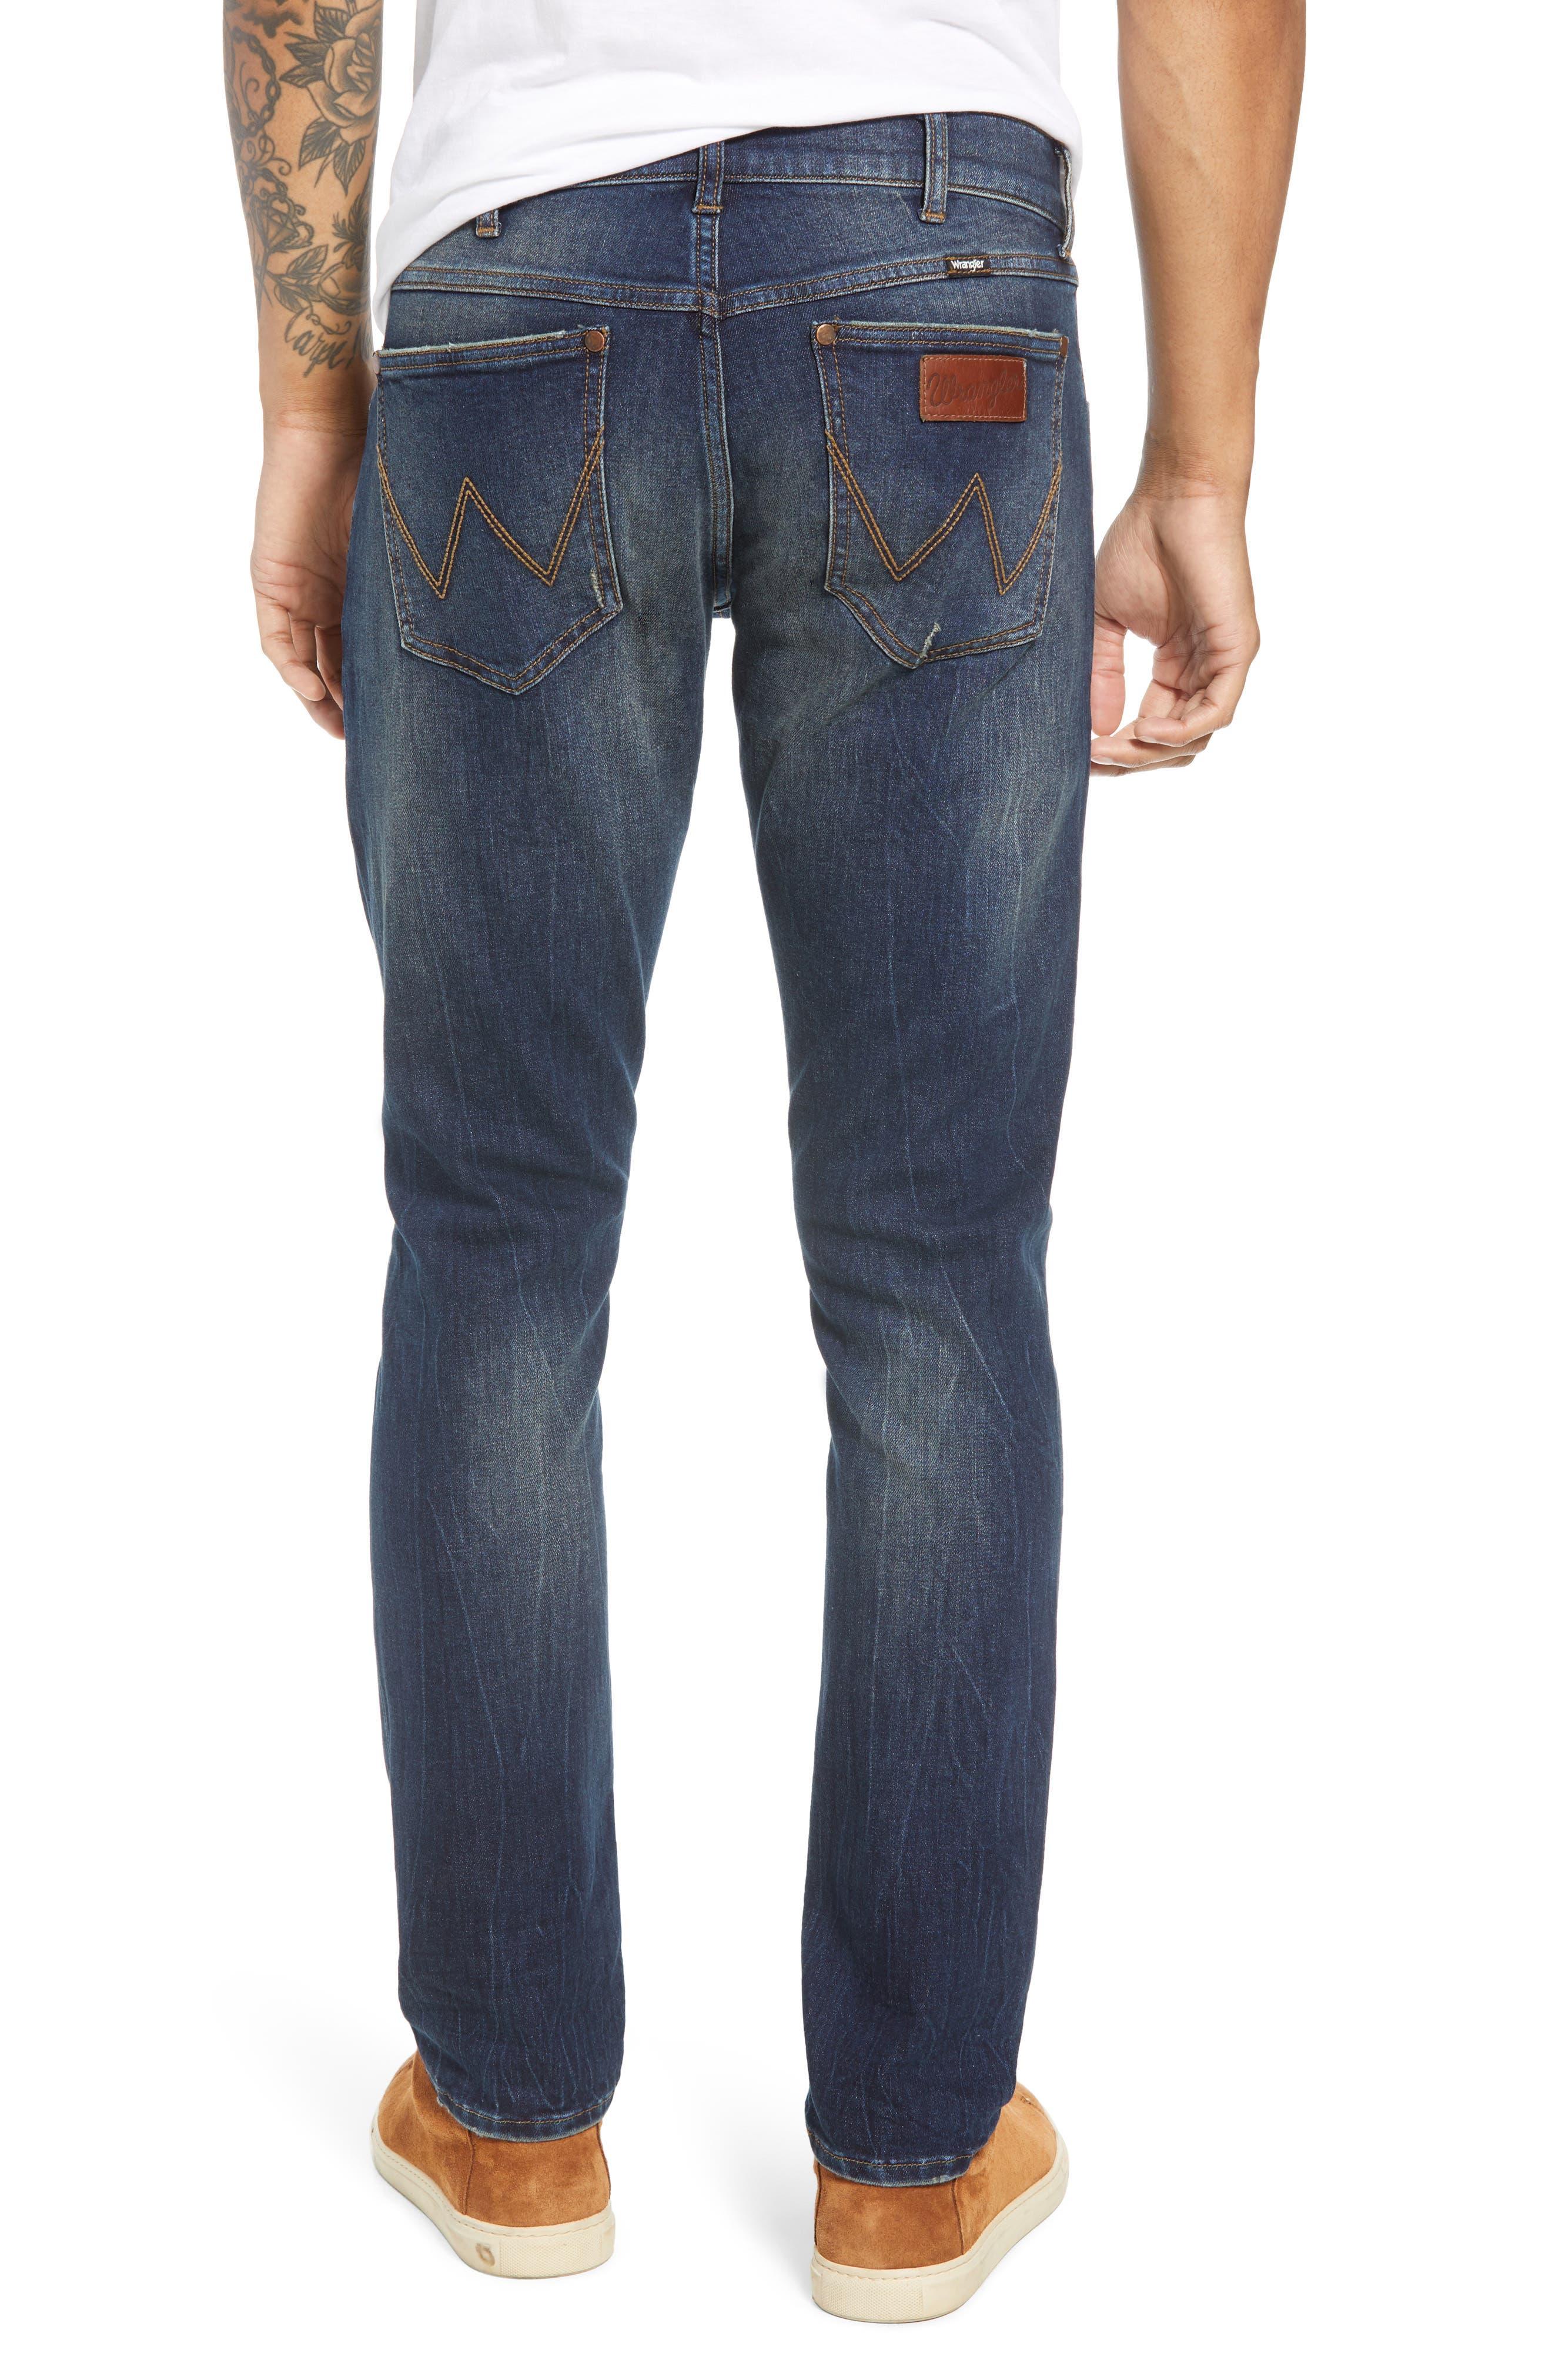 Larston Slim Fit Jeans,                             Alternate thumbnail 2, color,                             VINTAGE DARK